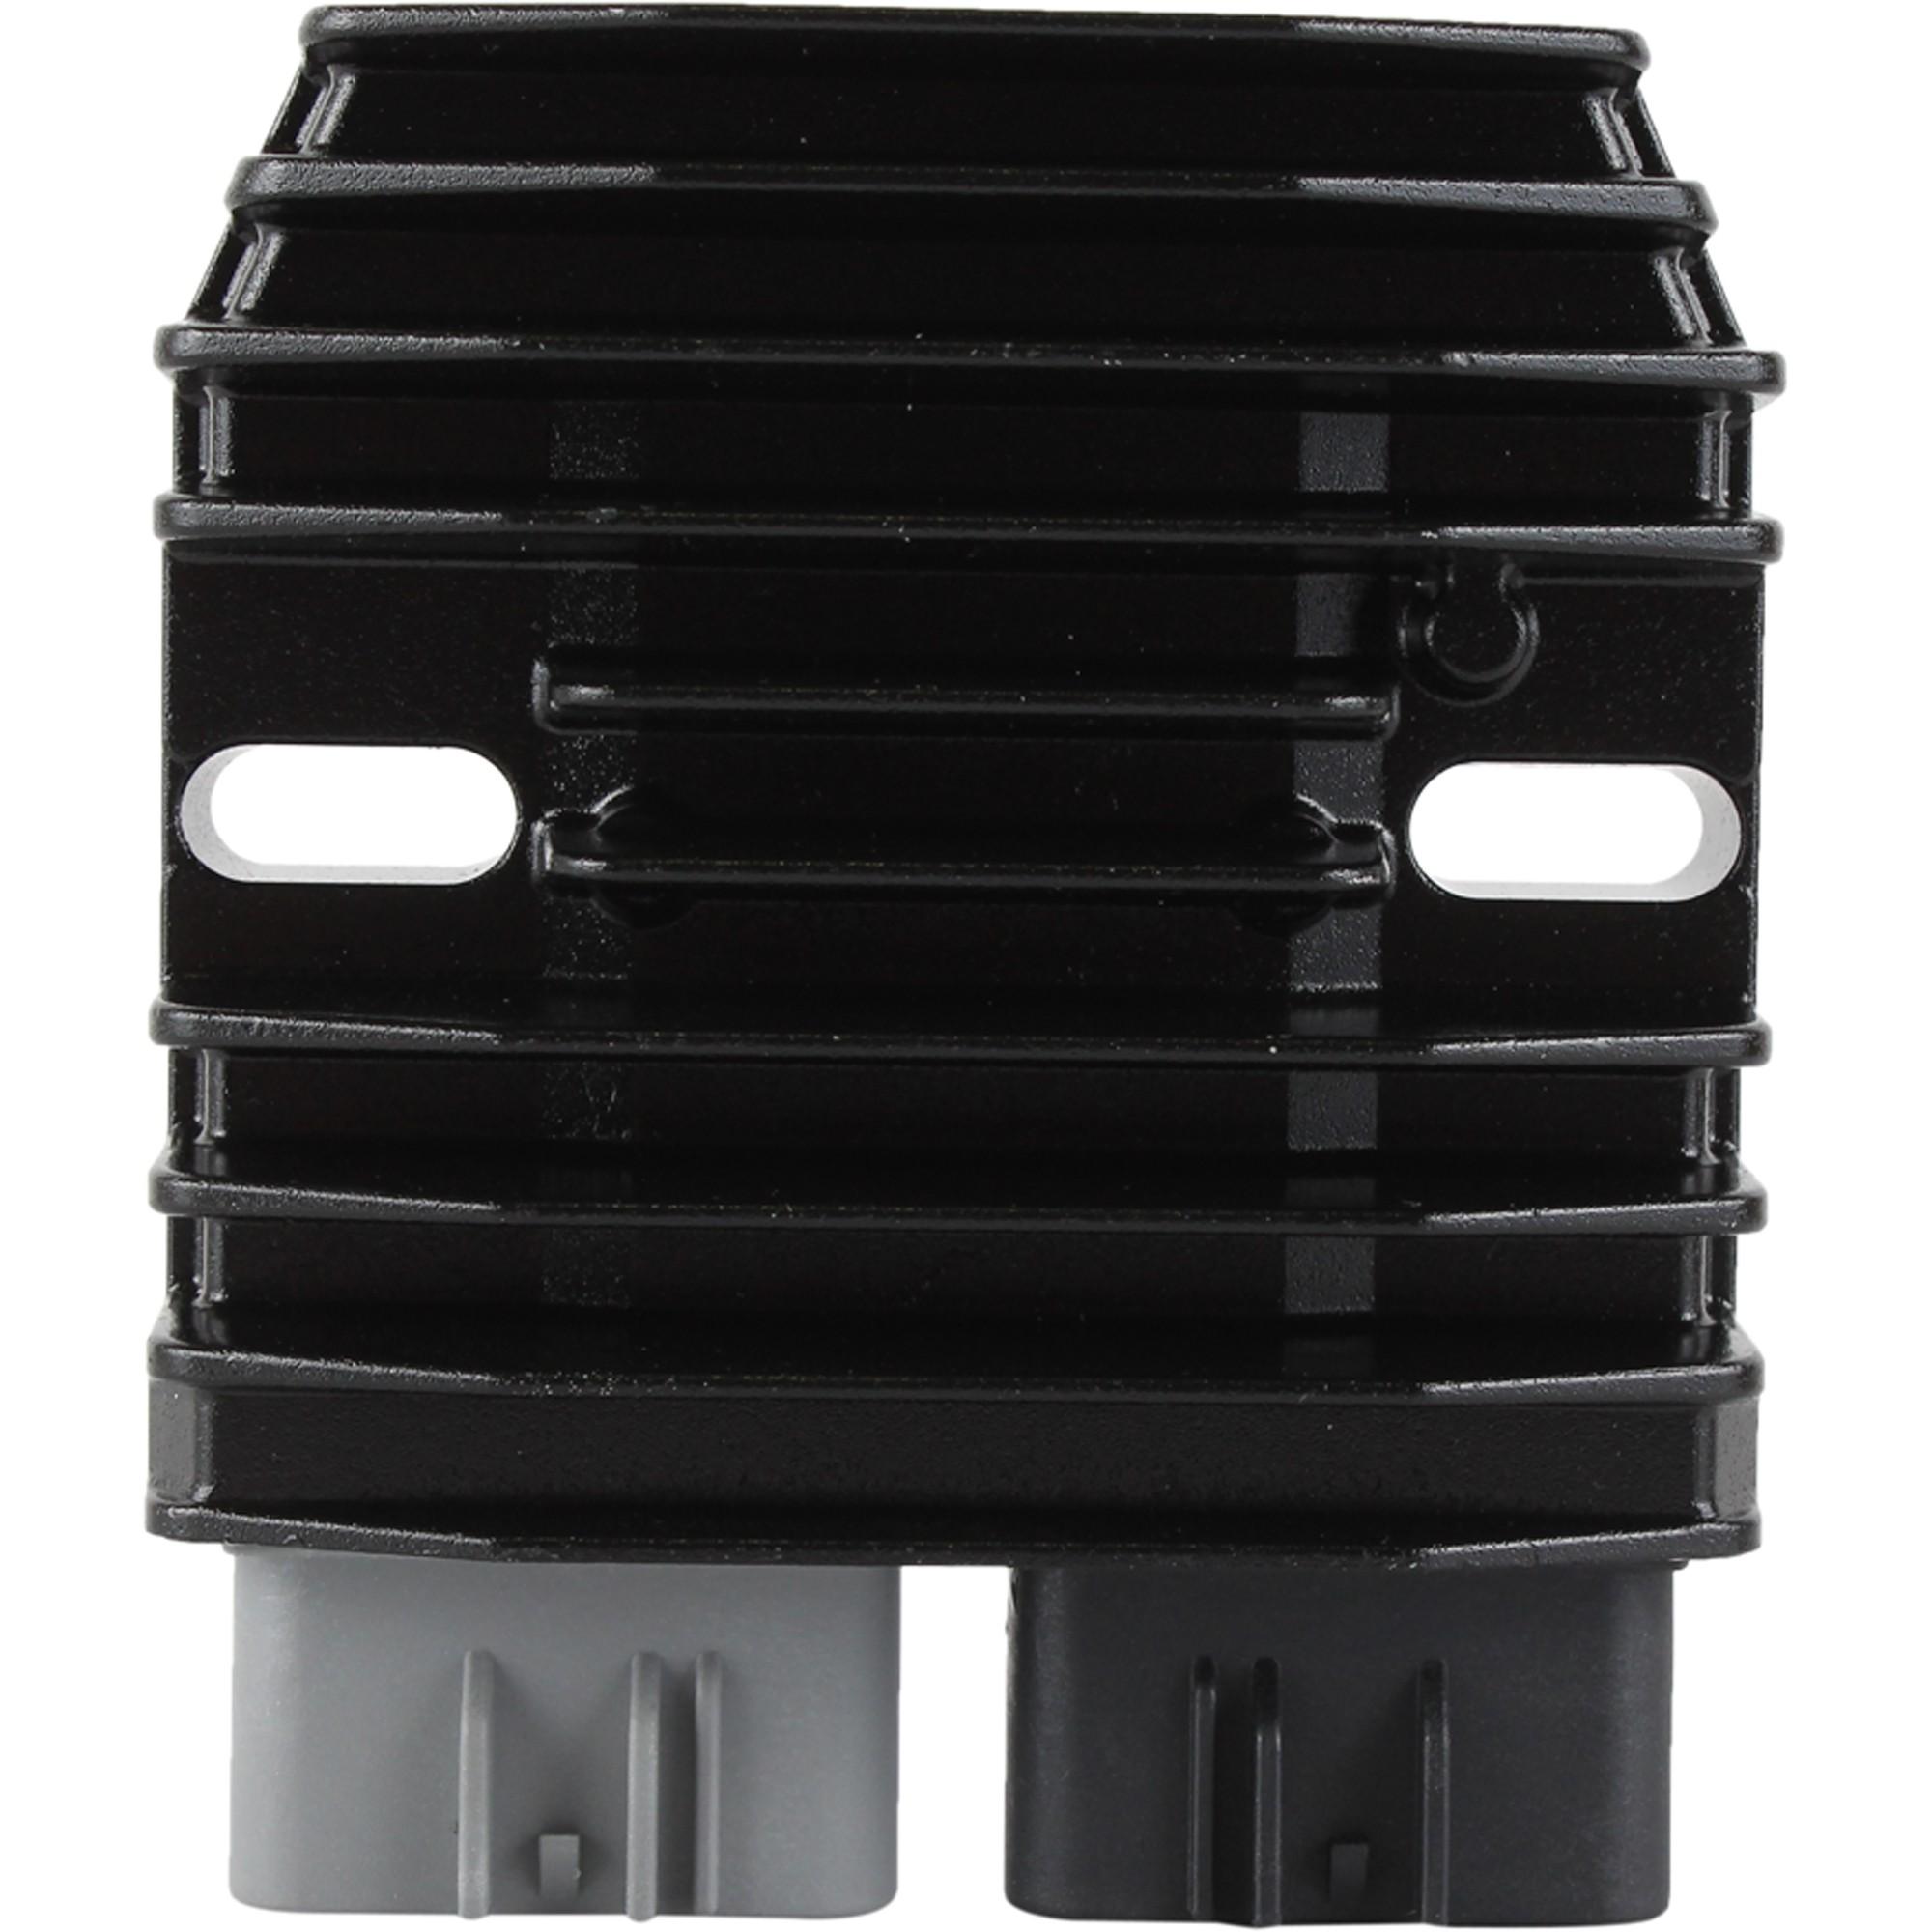 NEW VOLTAGE REGULATOR RECTIFIER for HONDA 700 MUV700 BIG RED 2009-2013 SH753AA